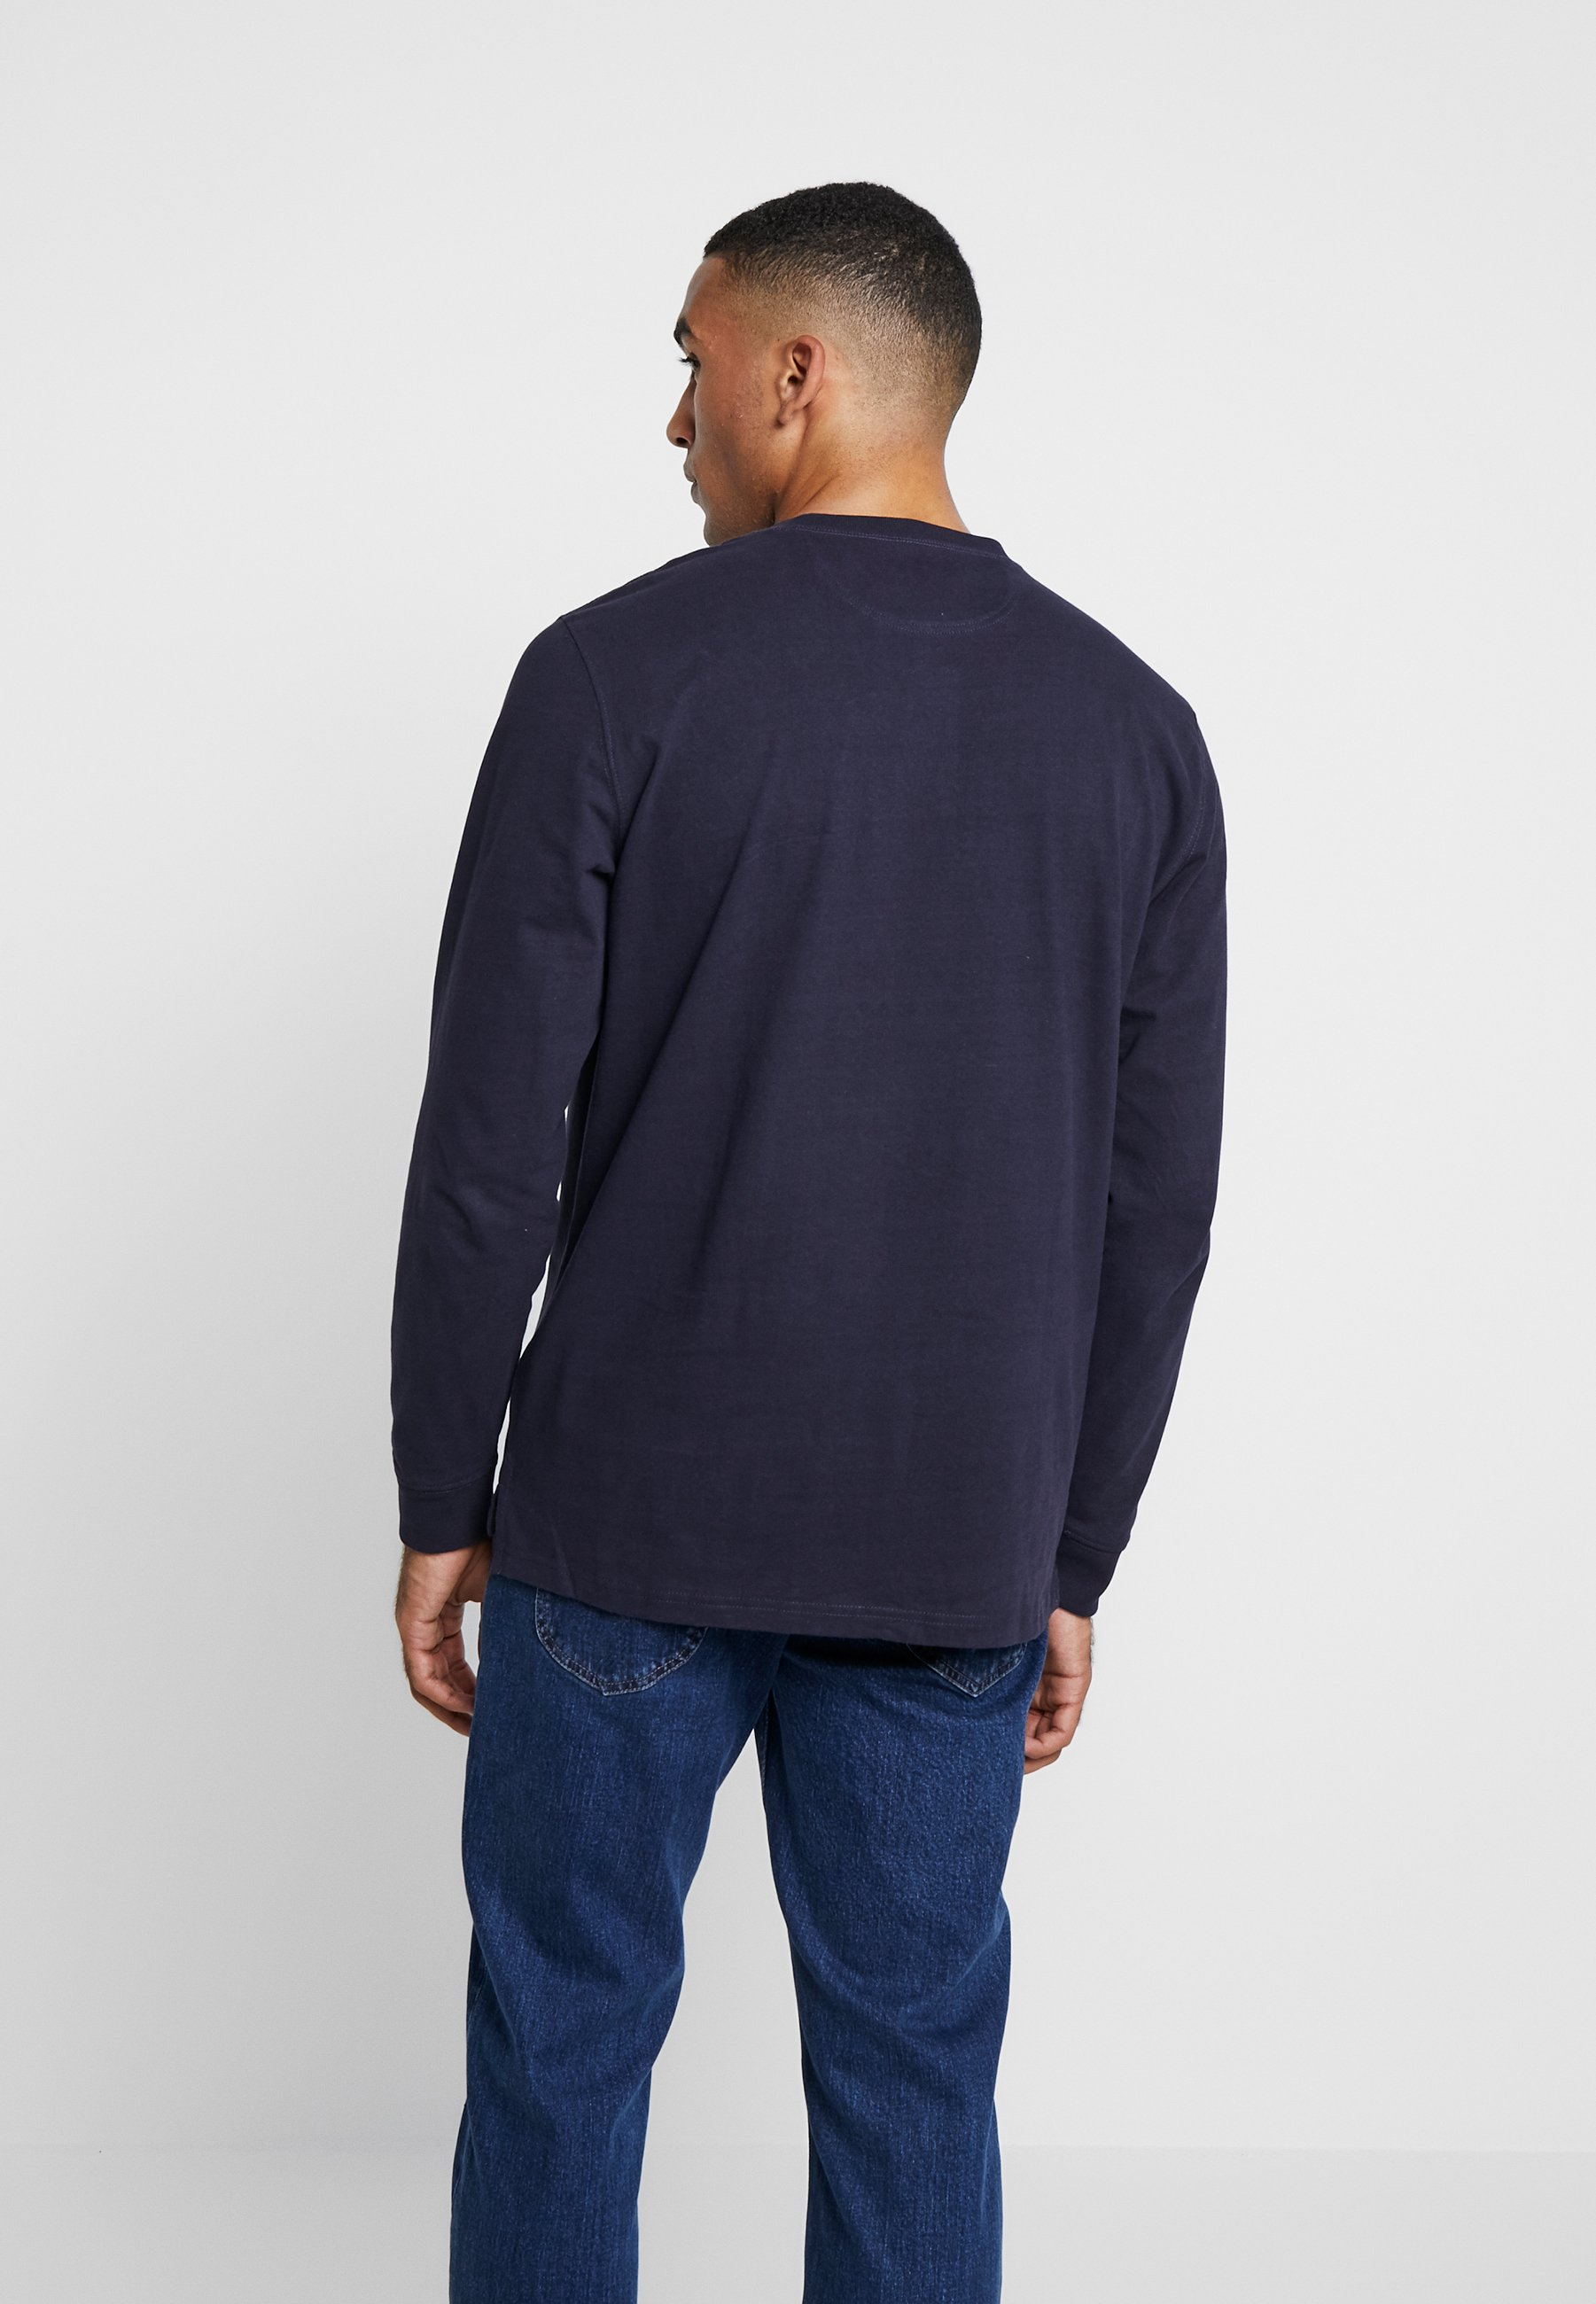 Midnight Longues Lee HenleyT À Manches shirt Navy Rjq4Lc35AS